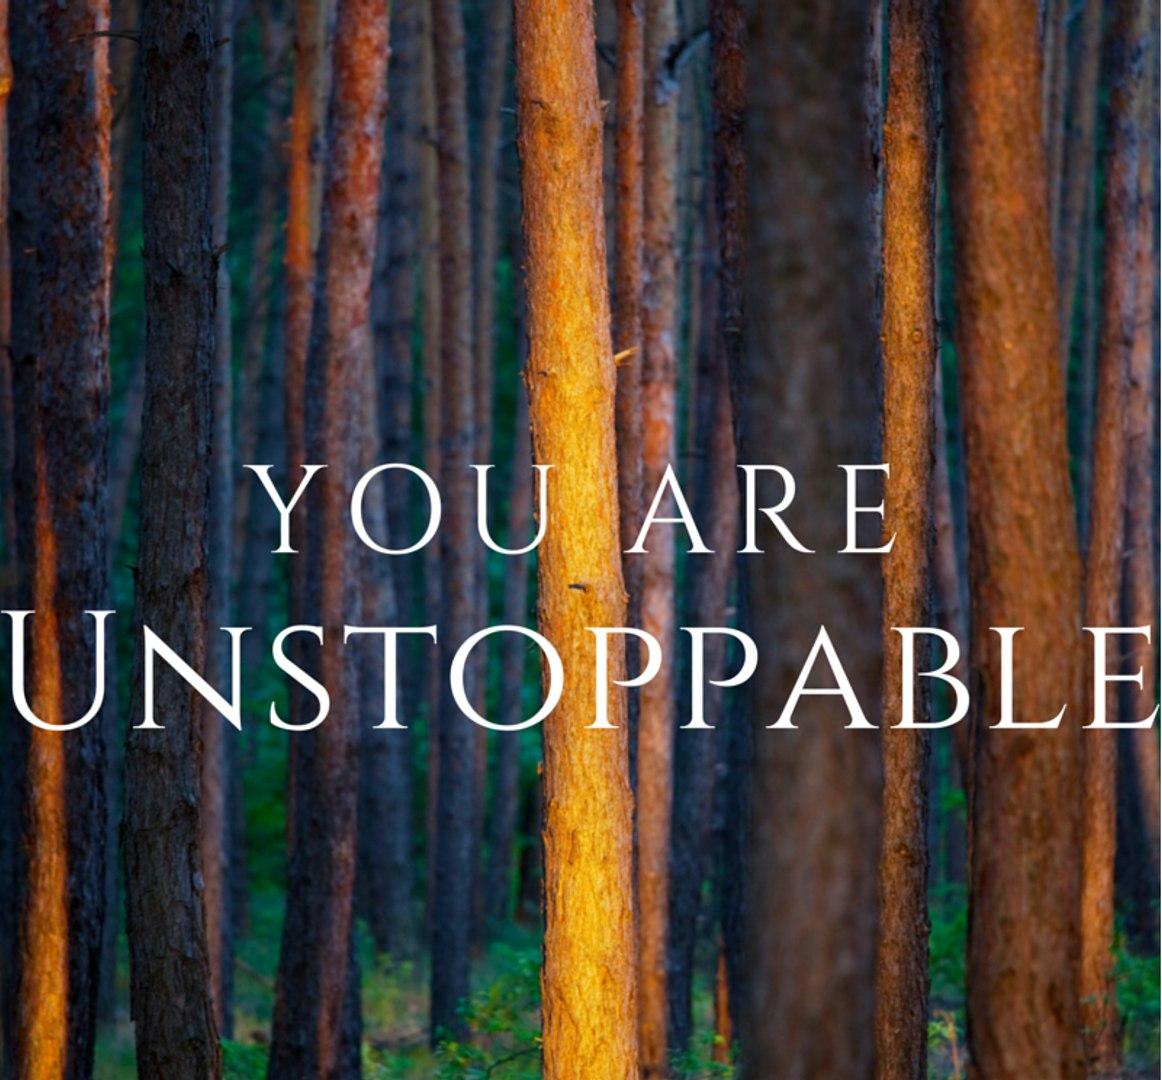 Unstoppable - Motivational Video